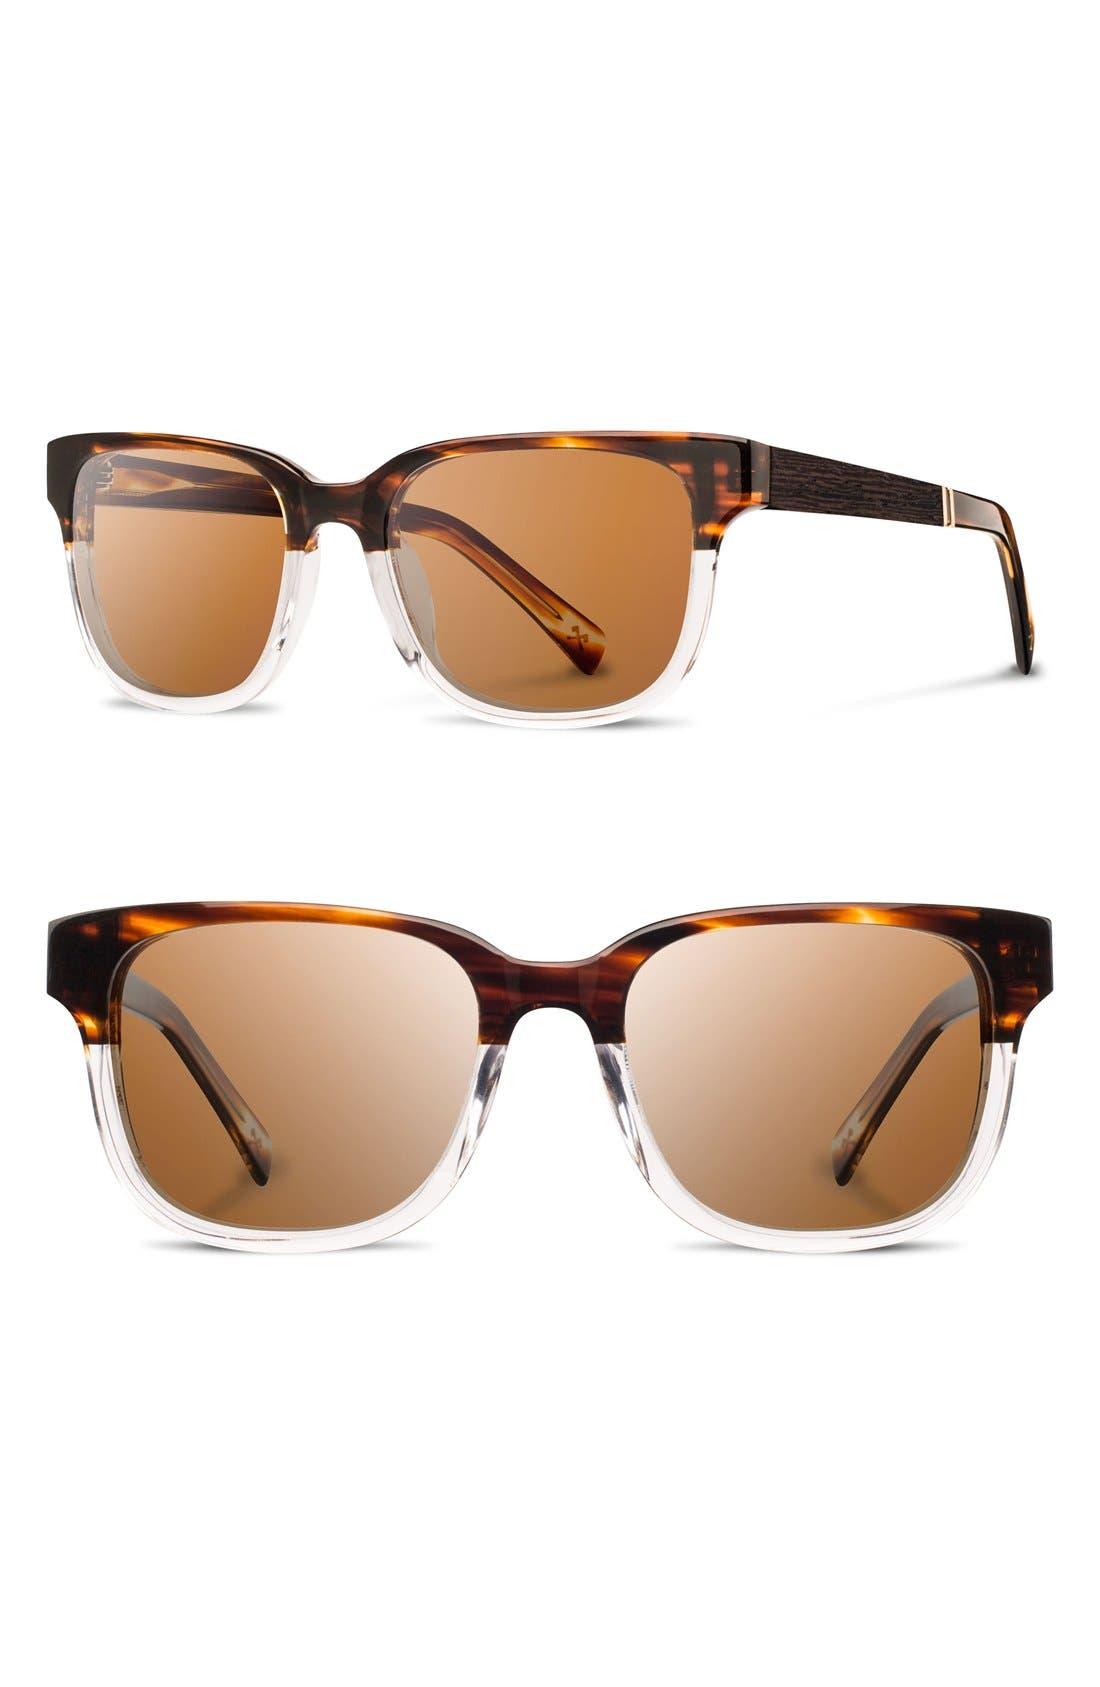 'Prescott' 52mm Polarized Acetate & Wood Sunglasses,                             Main thumbnail 1, color,                             222